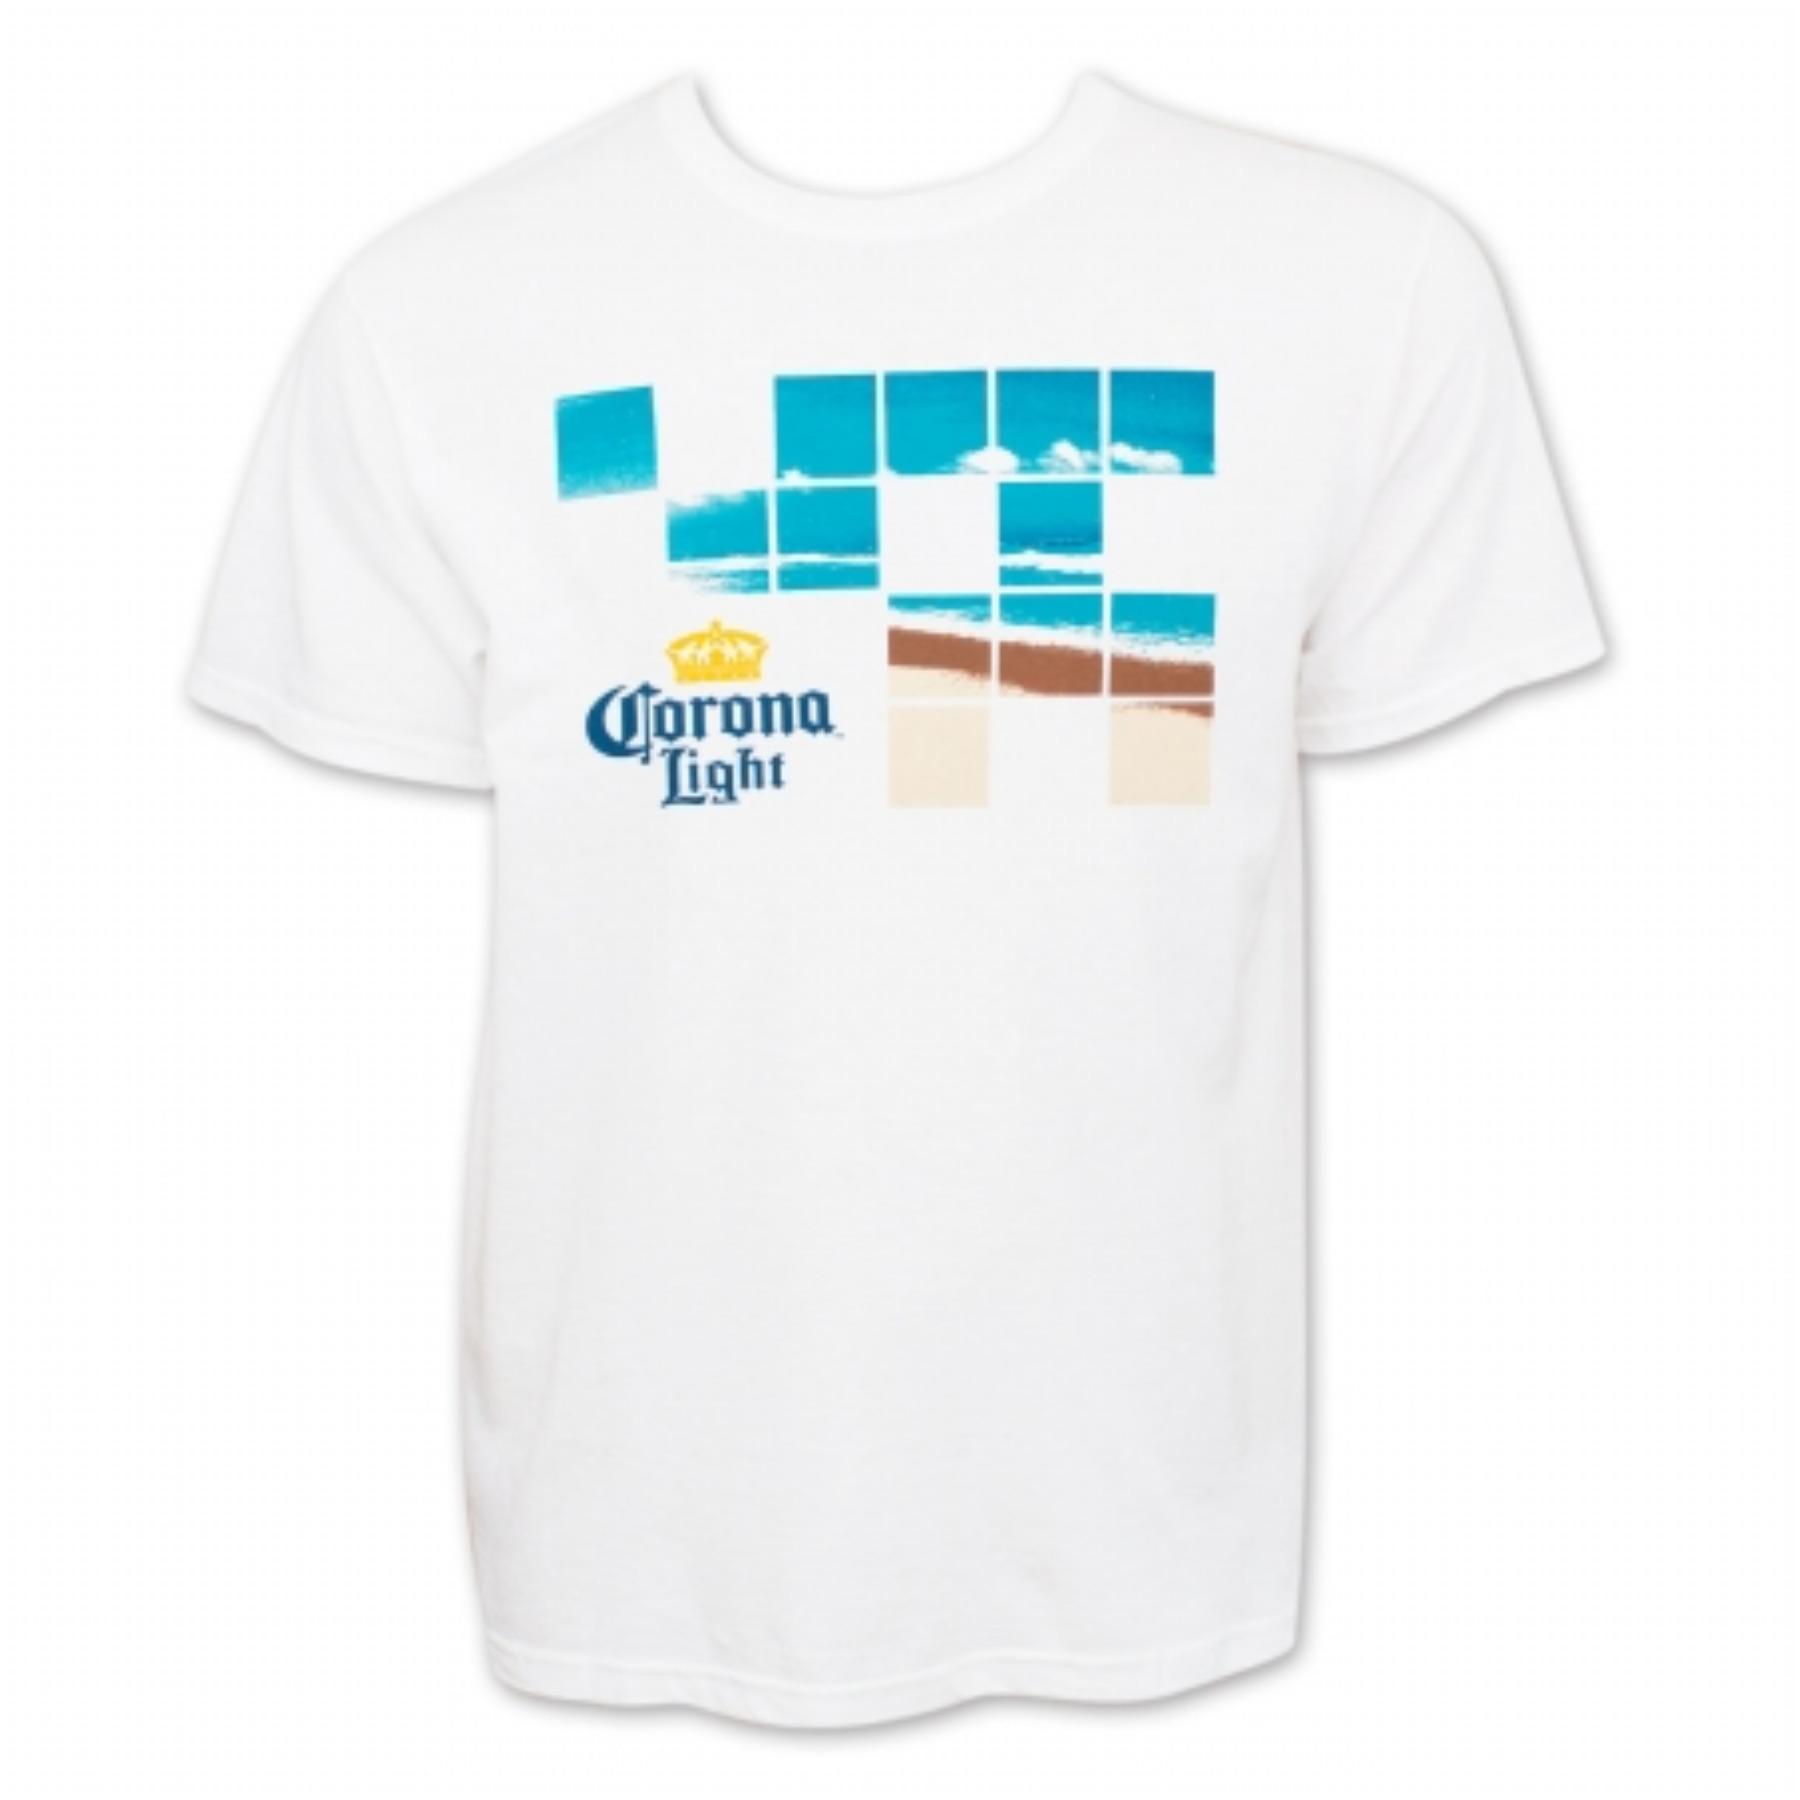 corona light office made shirt photo - 1